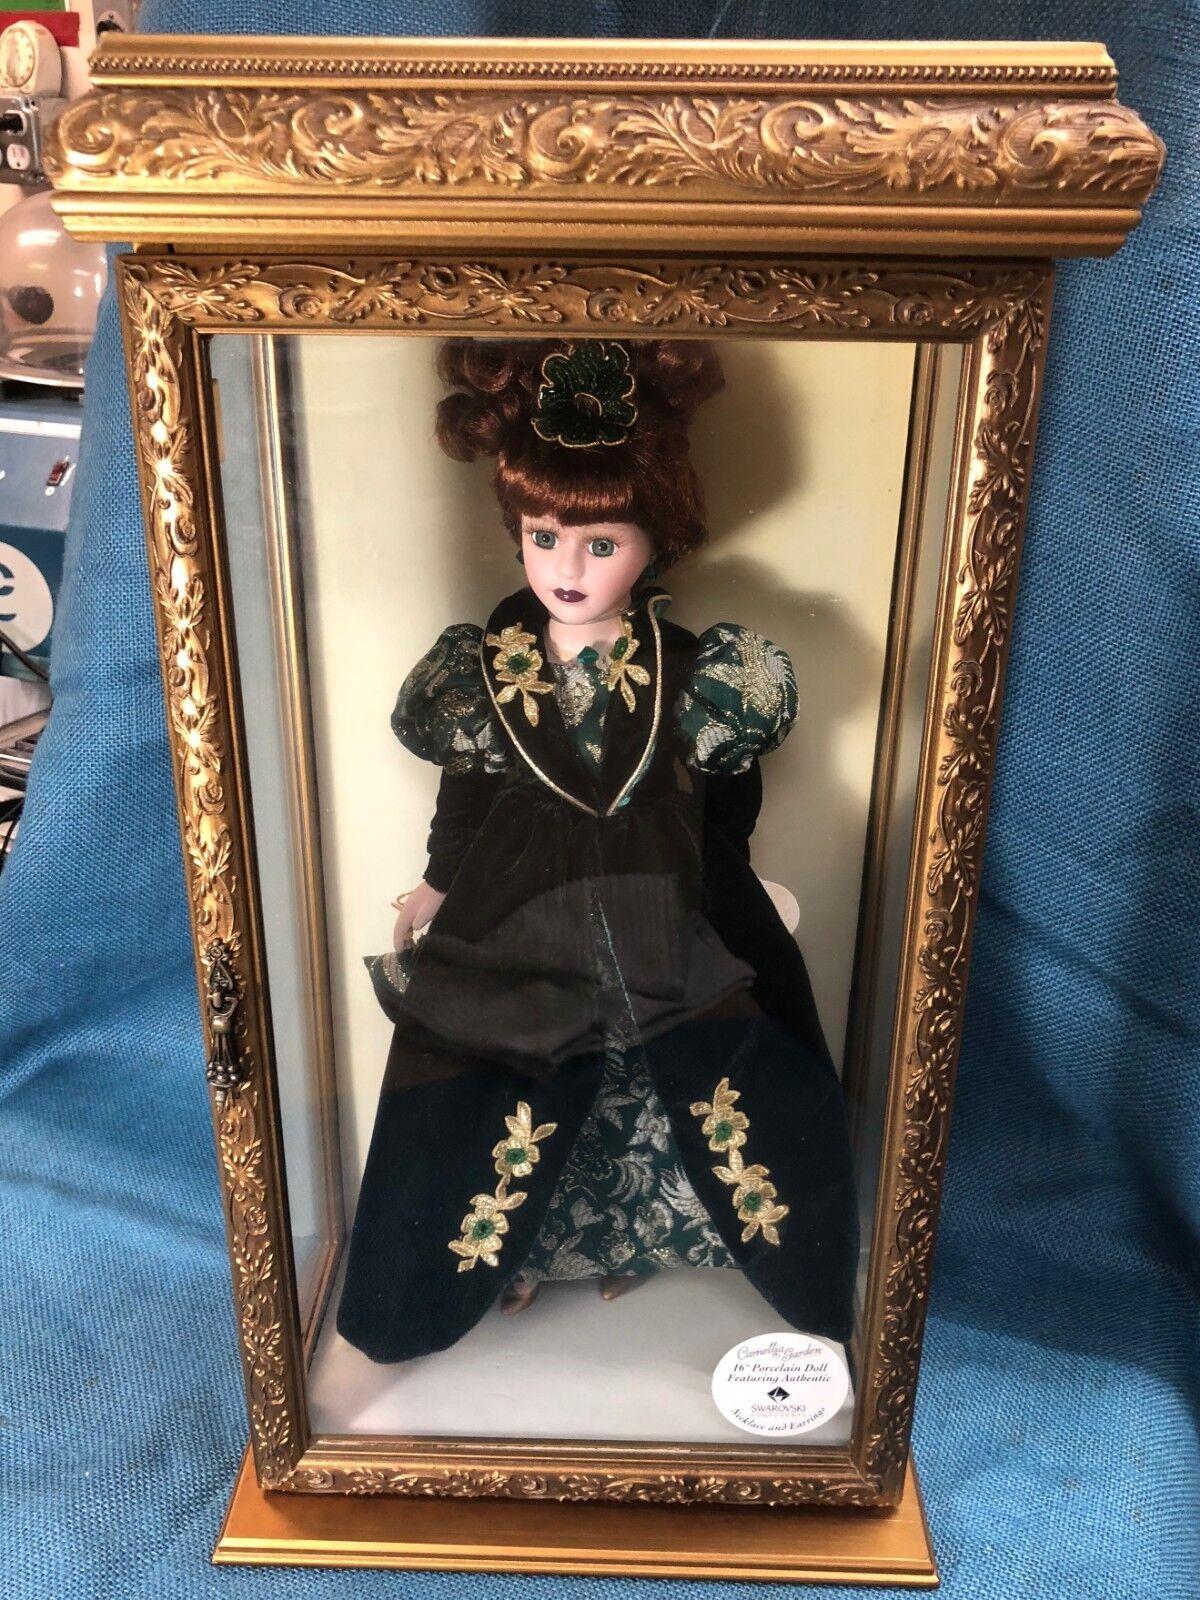 Camellia Garden 16  Porcelain Doll with Swavorski in Case